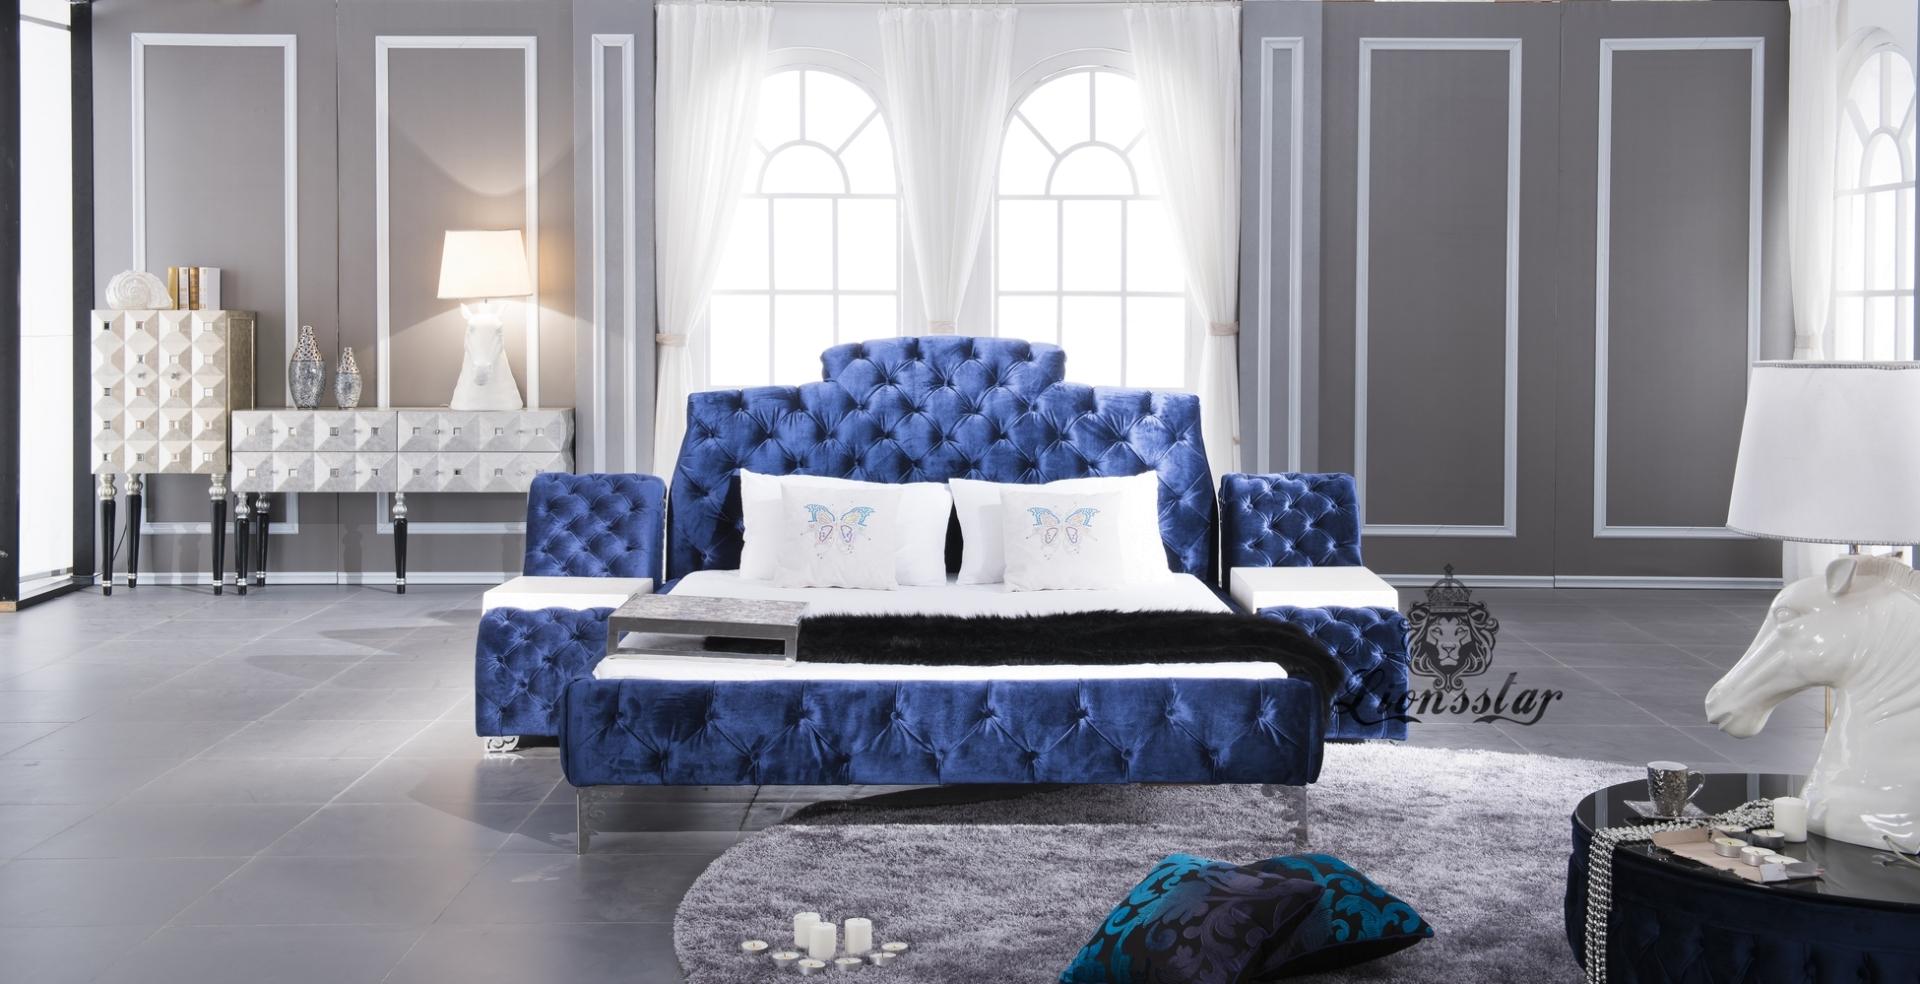 Designer Luxus Polsterbett